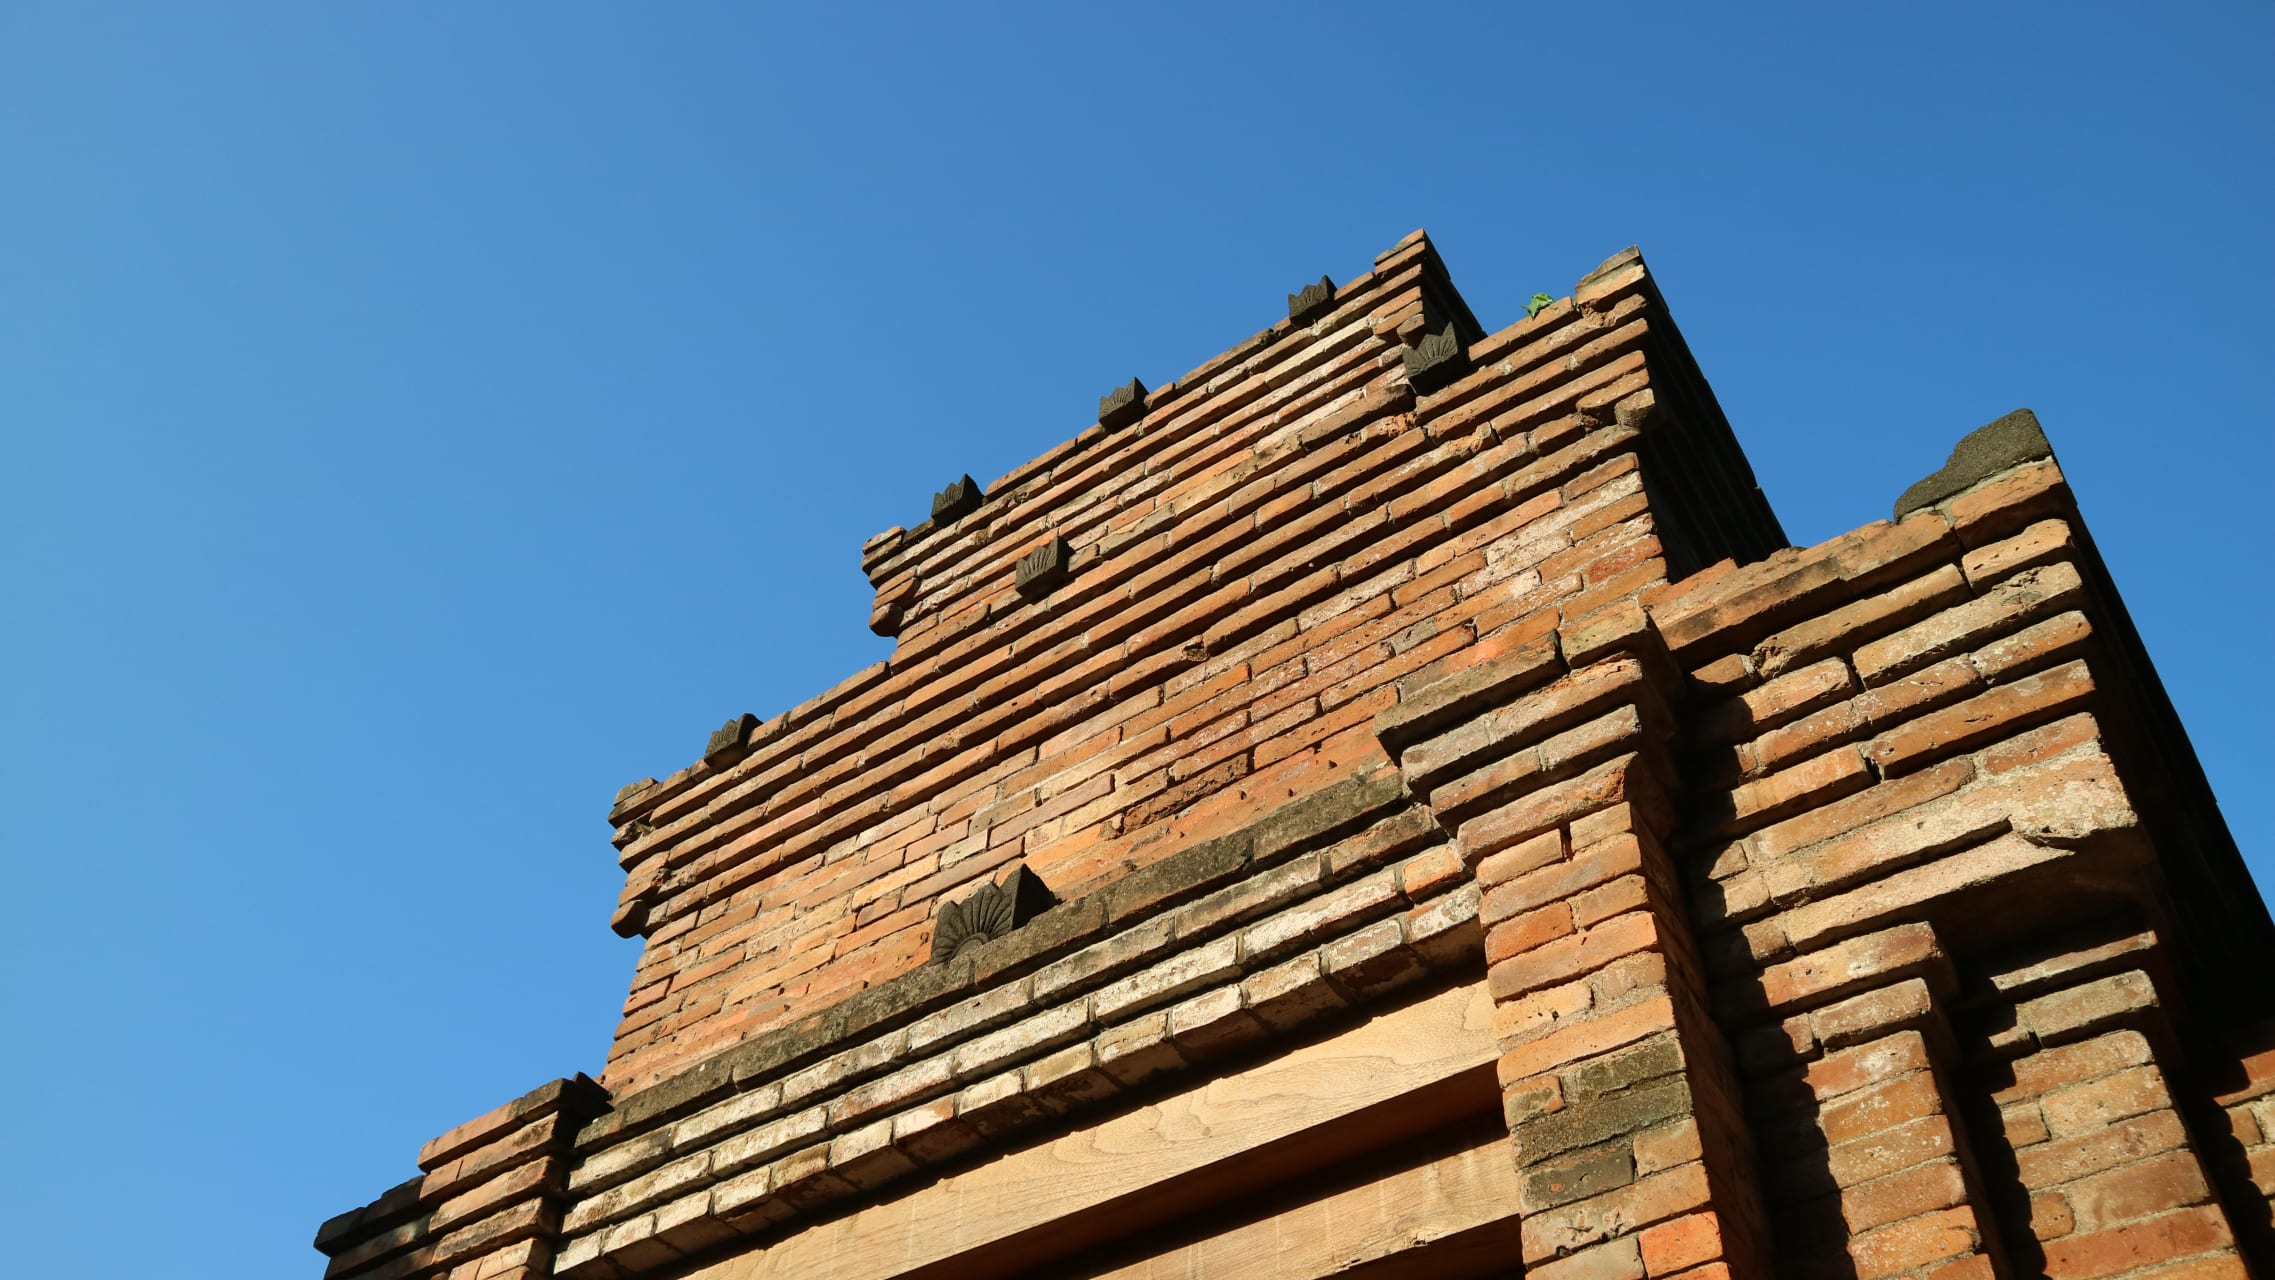 Yogyakarta - Sonobudoyo Museum part-1: Relive the Prehistory and Classical Era of Java